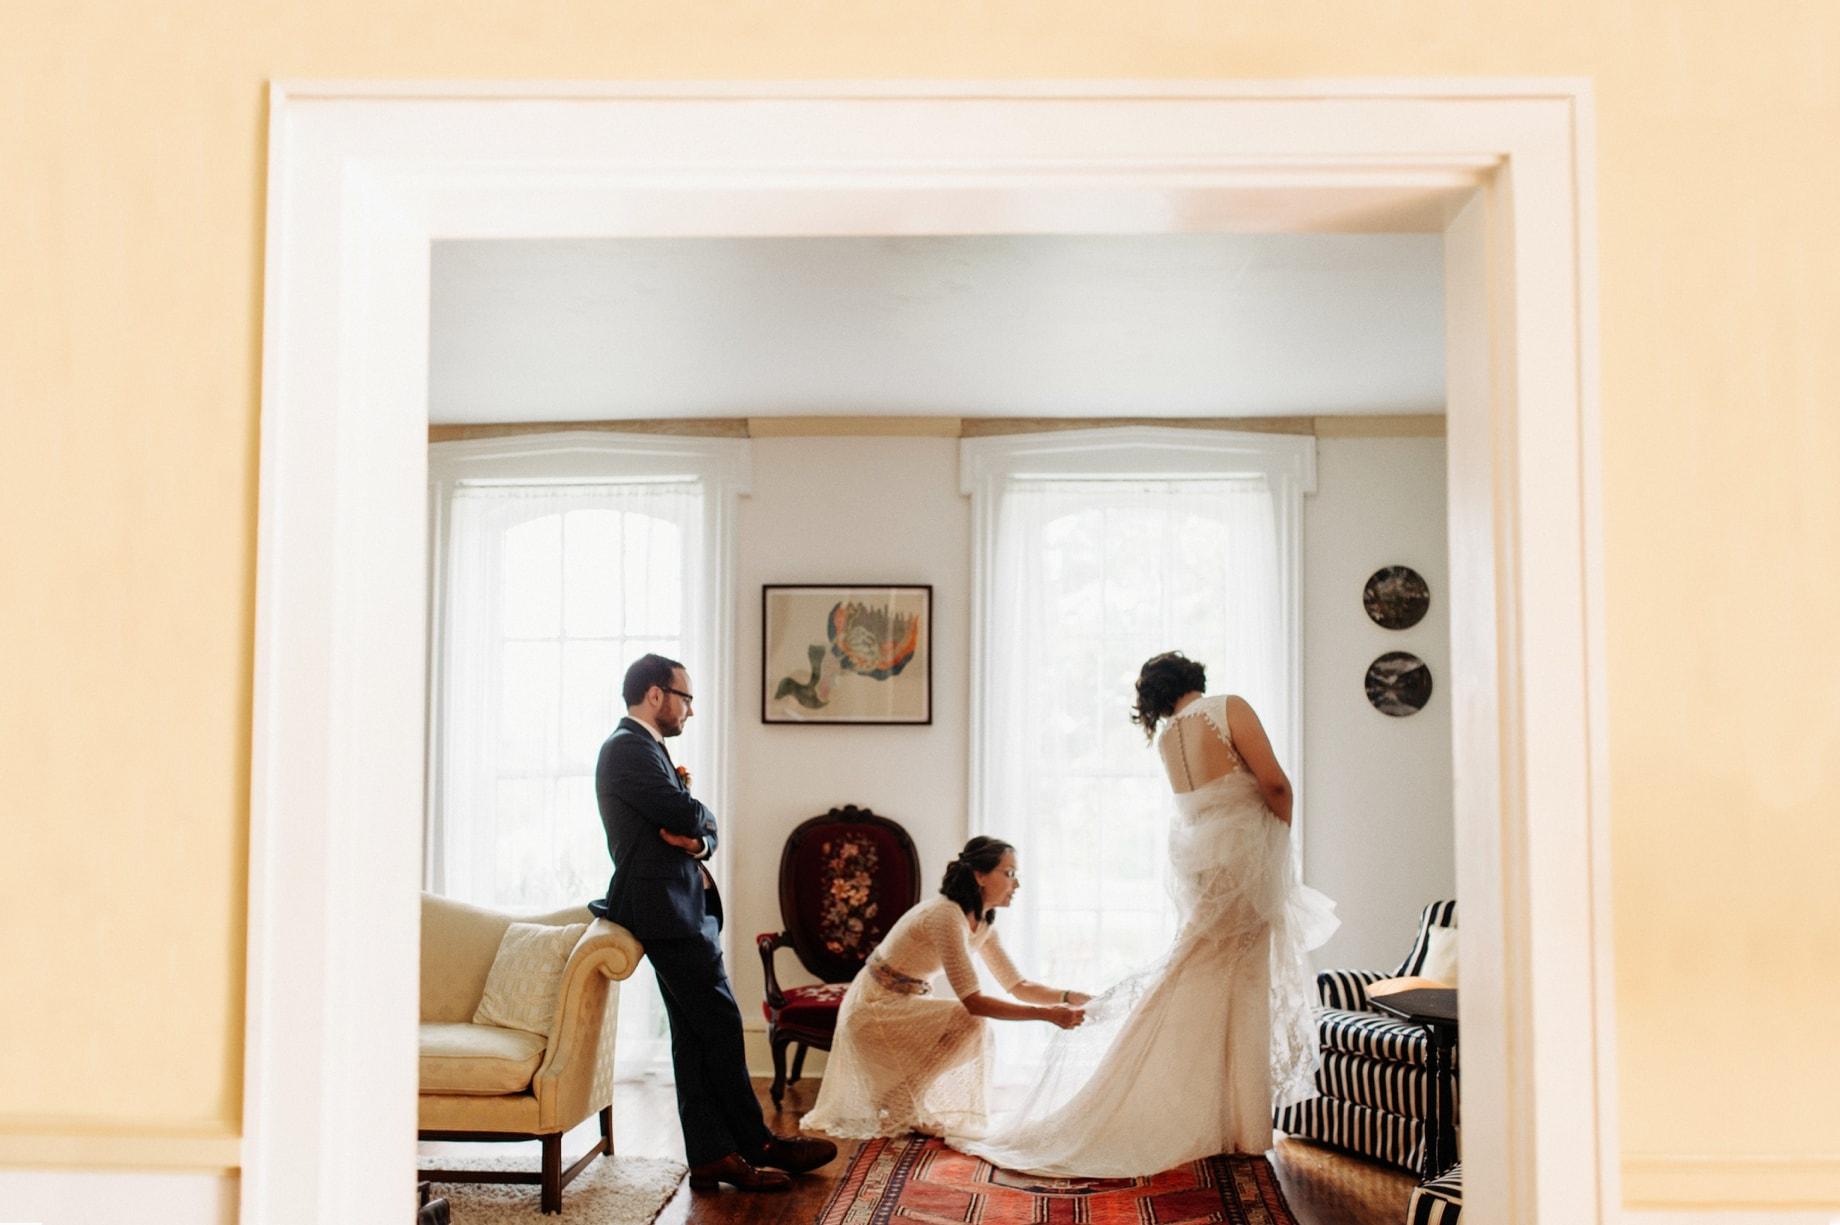 mother of the bride bustleling dress